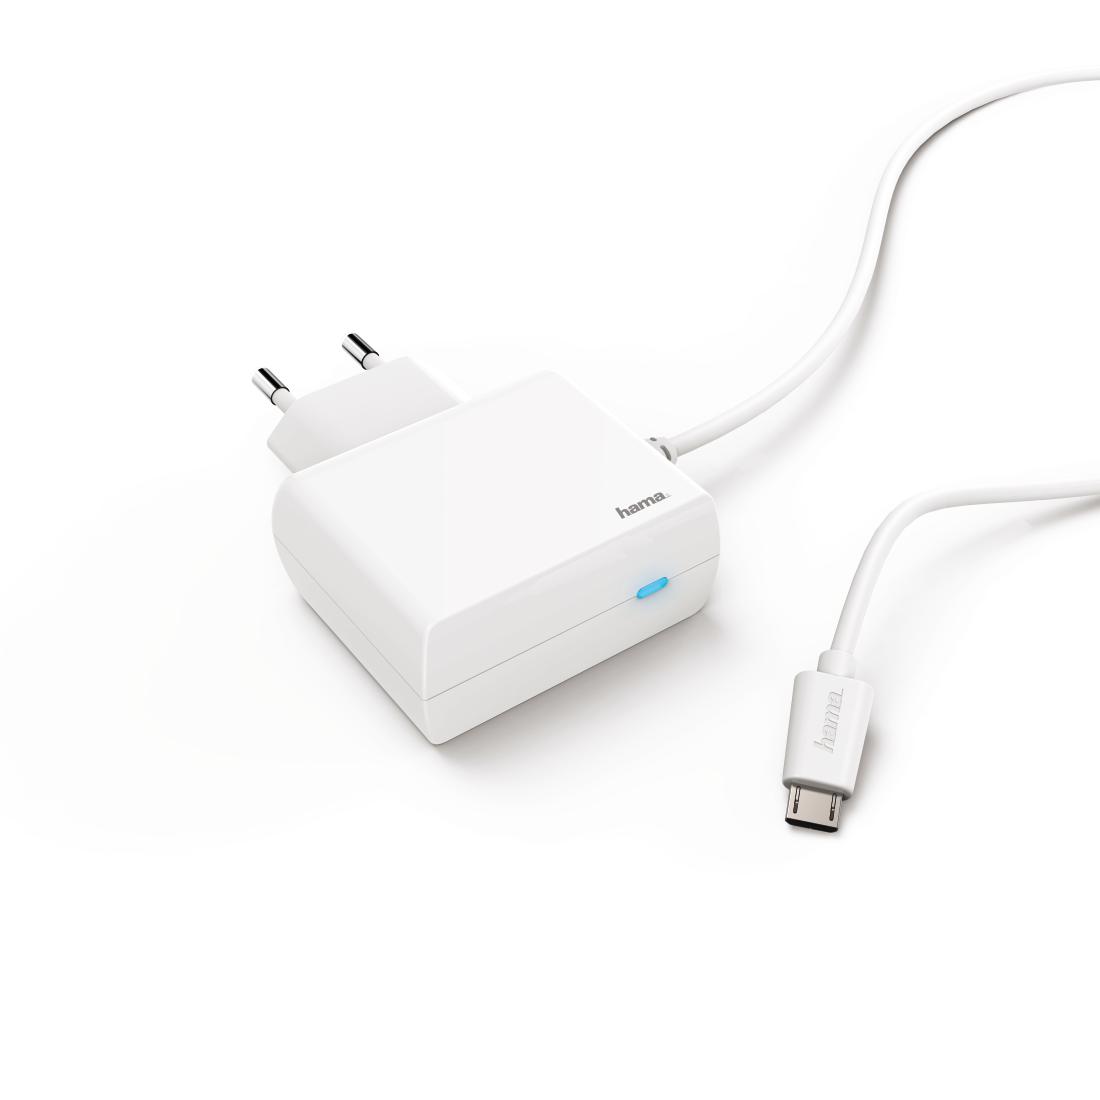 00183249 Hama Ladegerät, Micro USB, 2,4 A, Weiß | Hama DE